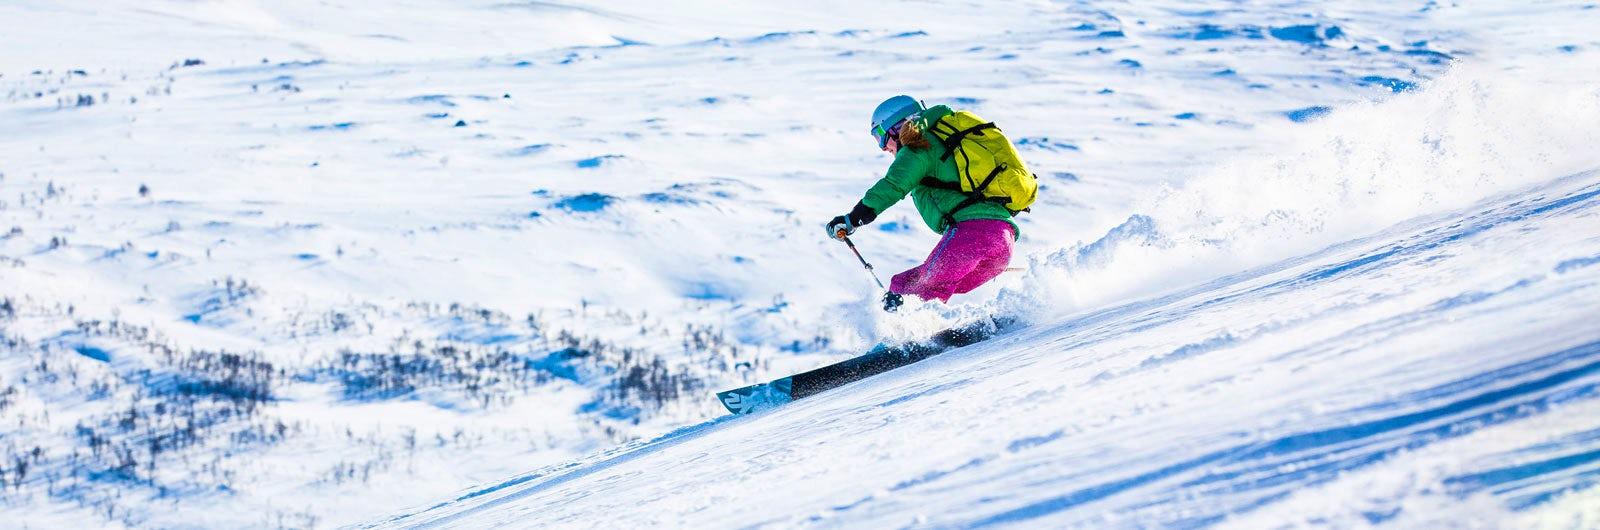 Skiing on steep mountain slope